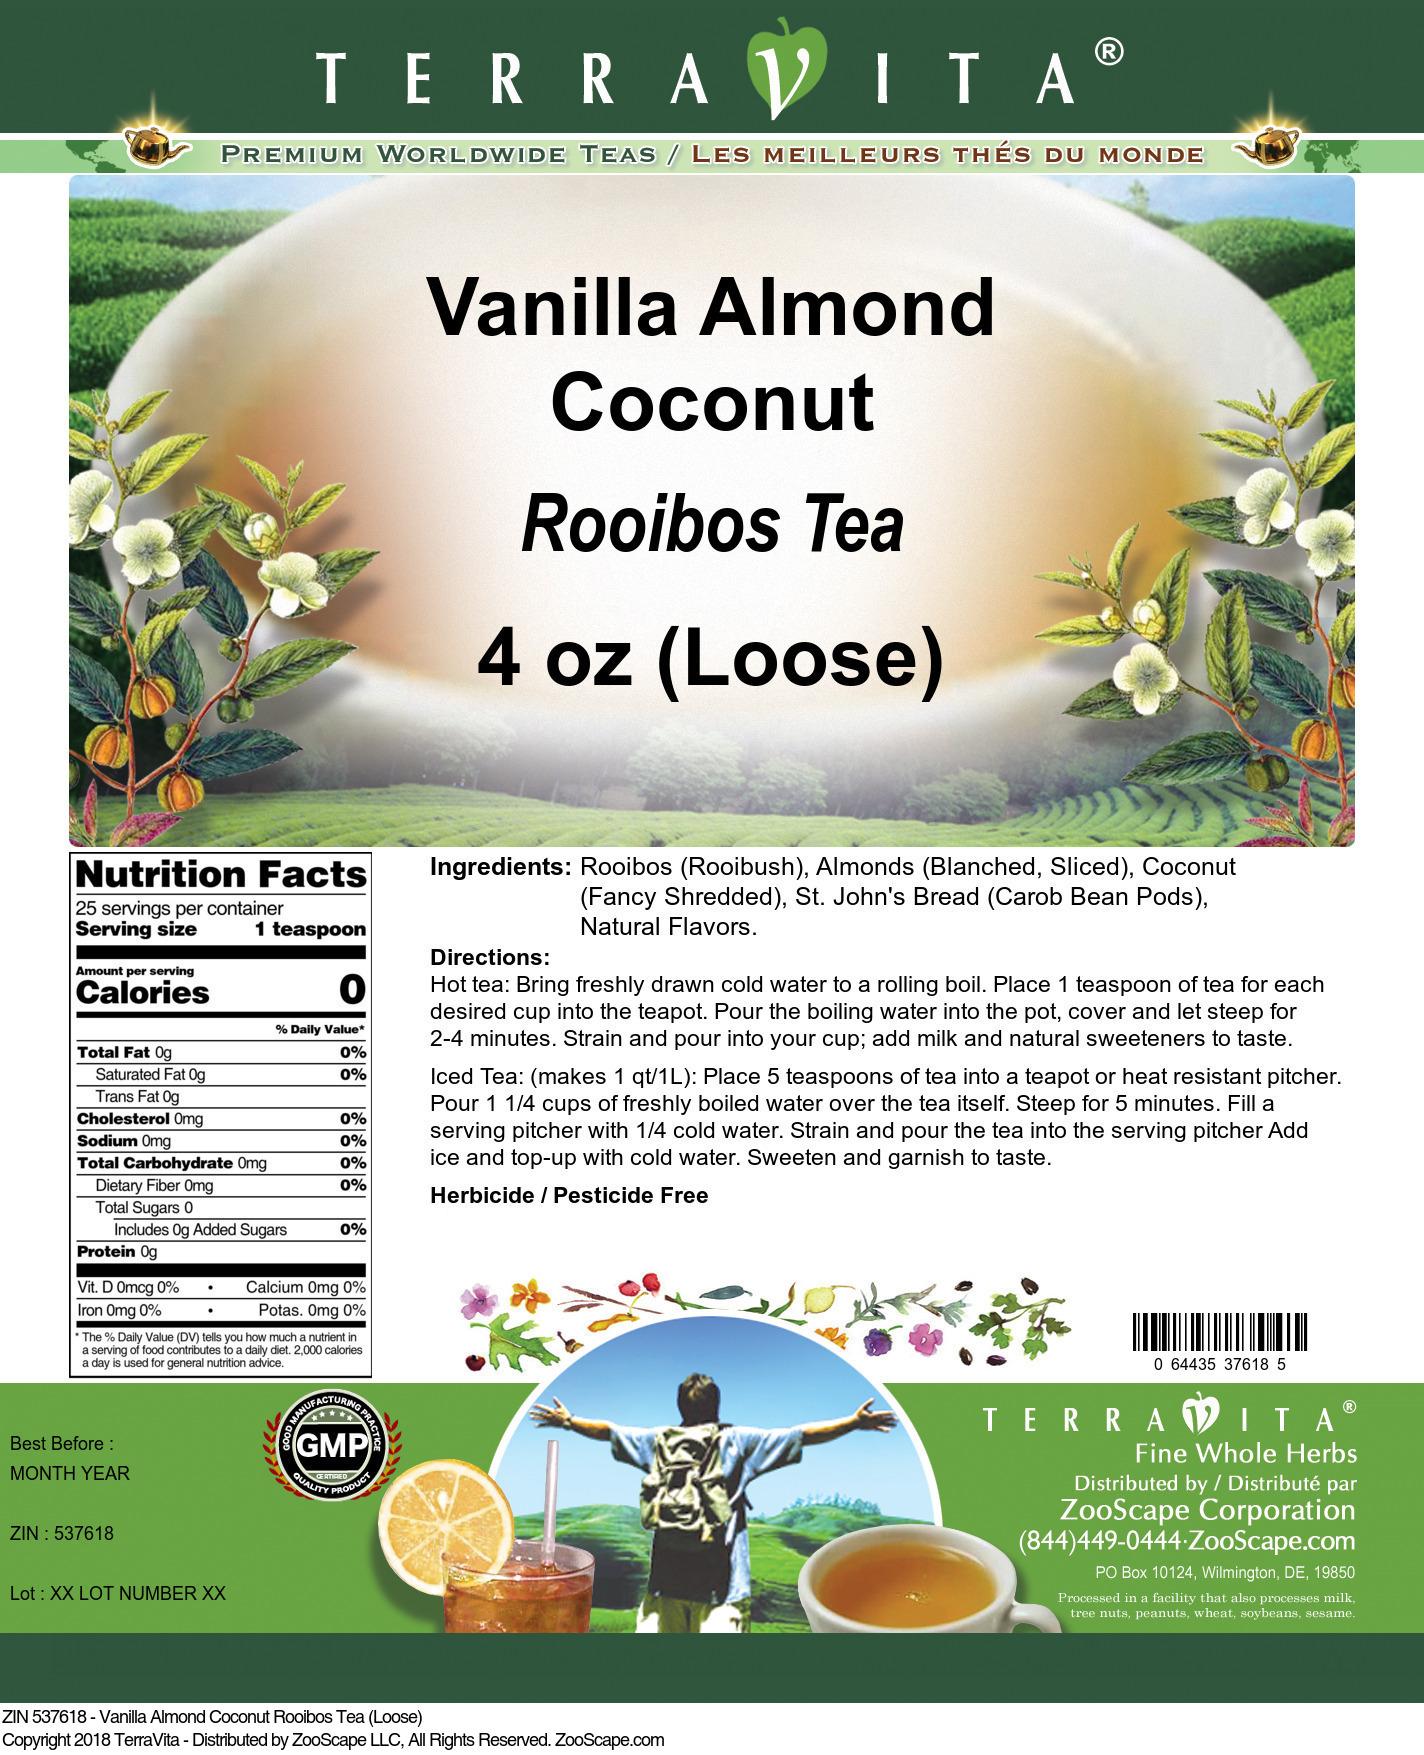 Vanilla Almond Coconut Rooibos Tea